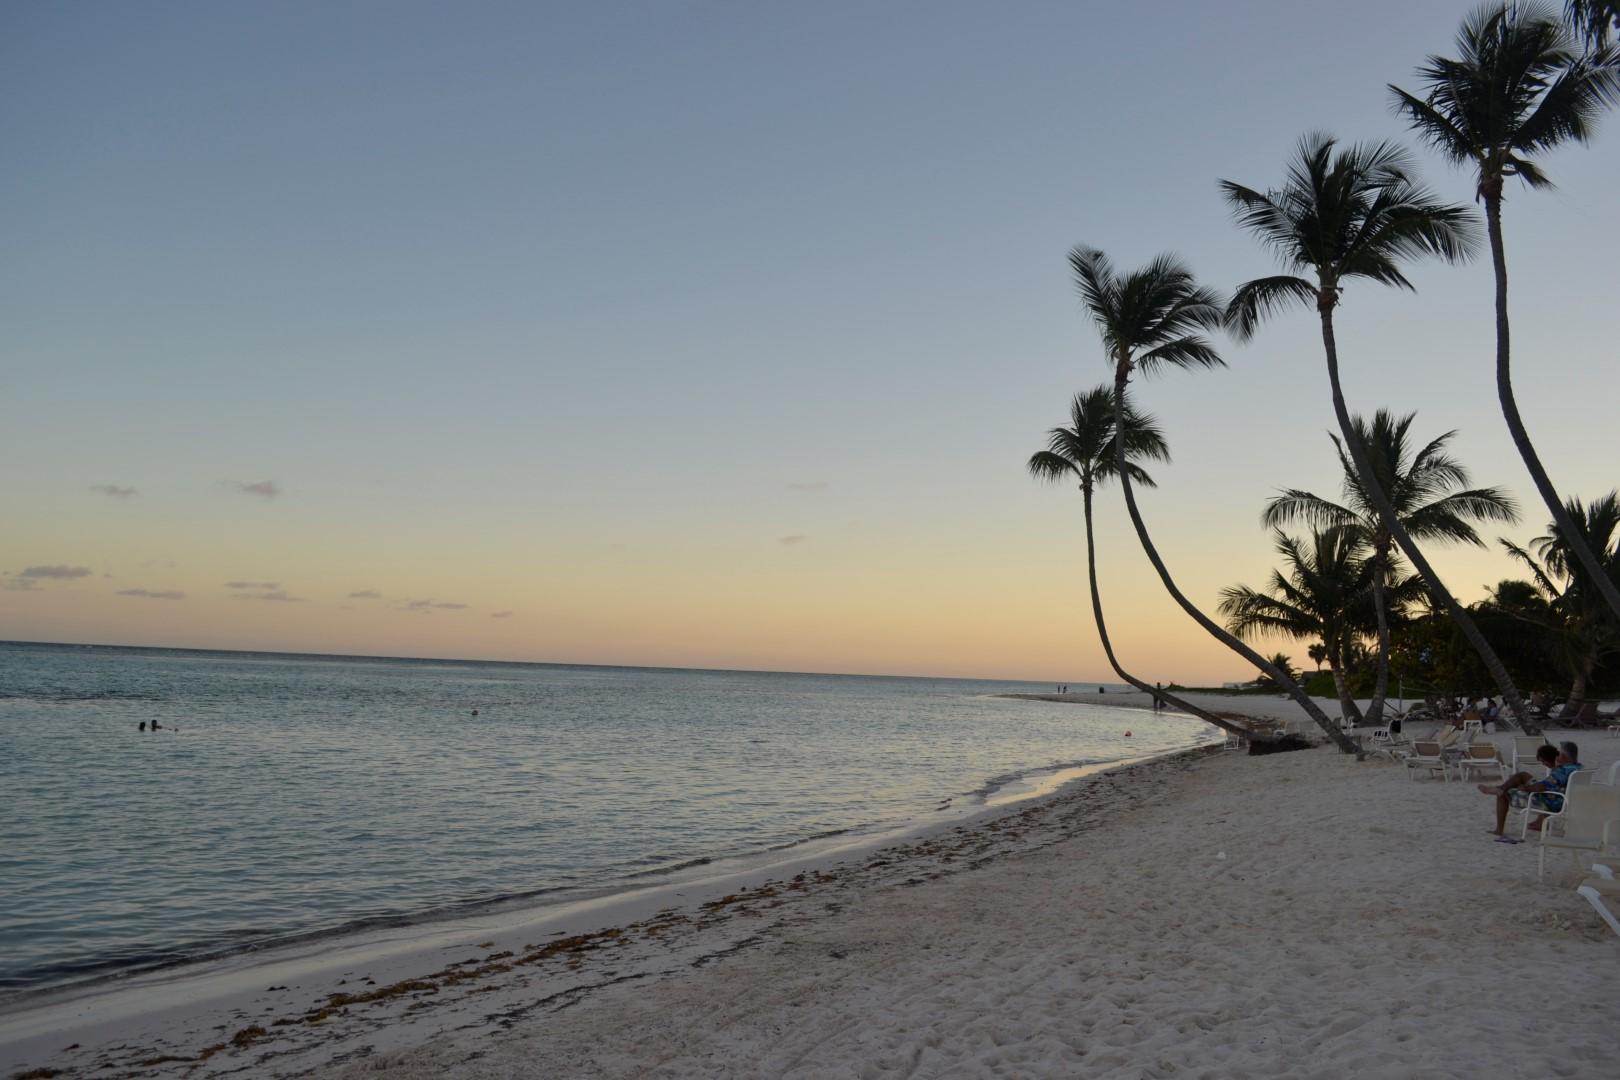 Playa Blanca, Punta Cana, Dominican Republic (photo: Andy Bruner)